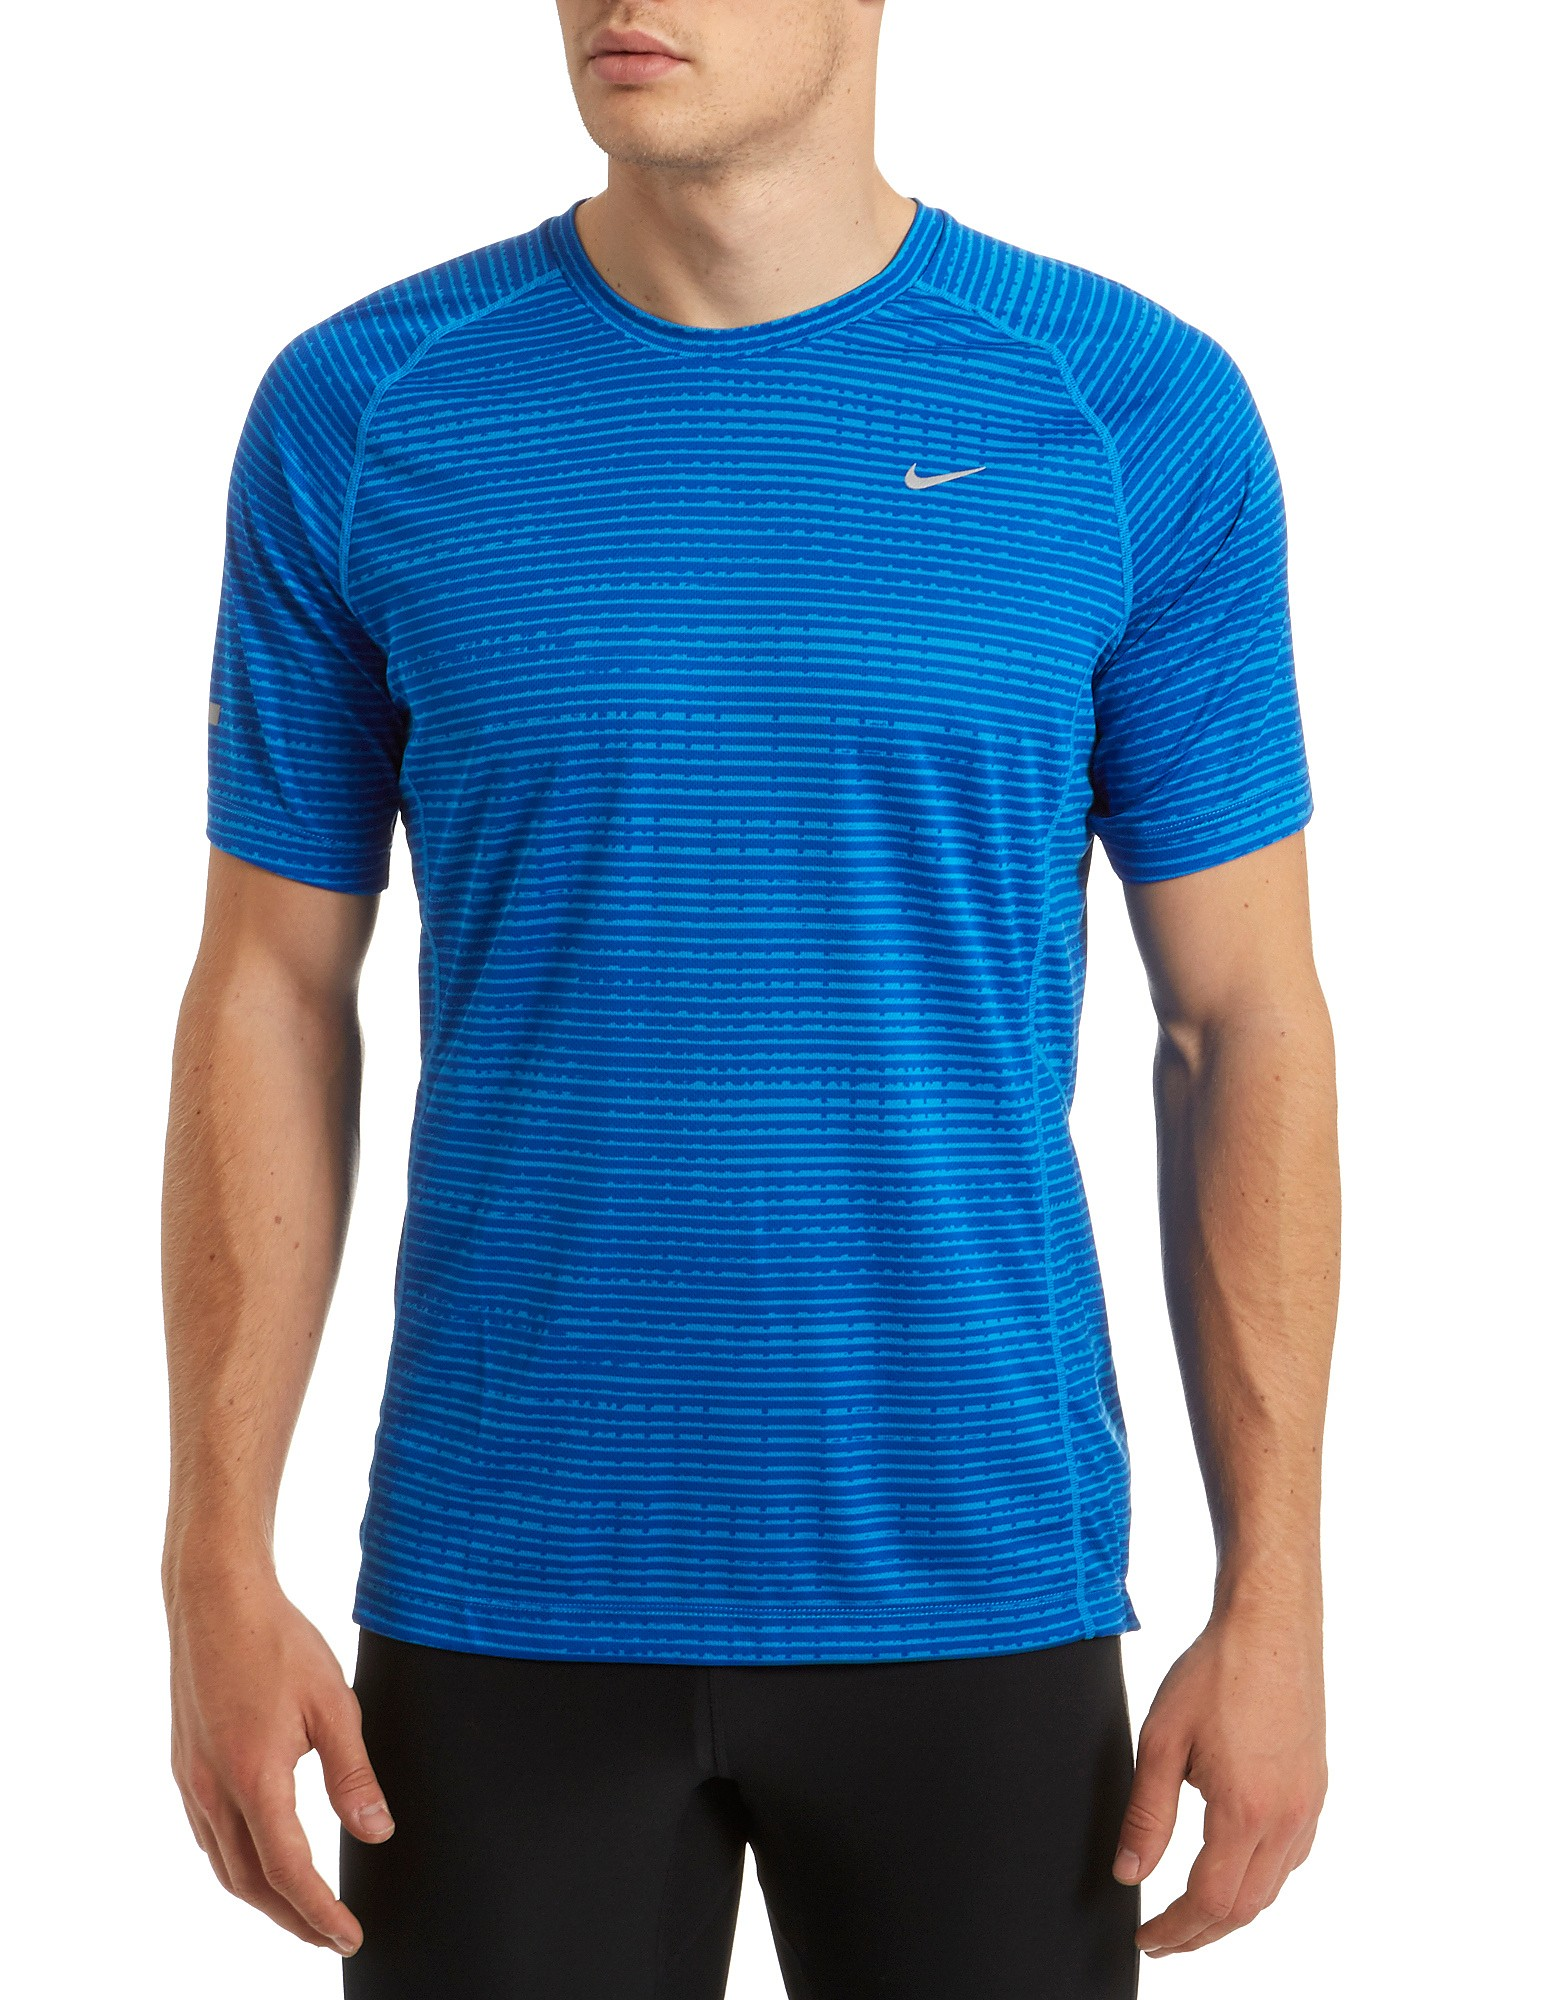 Nike Printed Miler T-Shirt product image